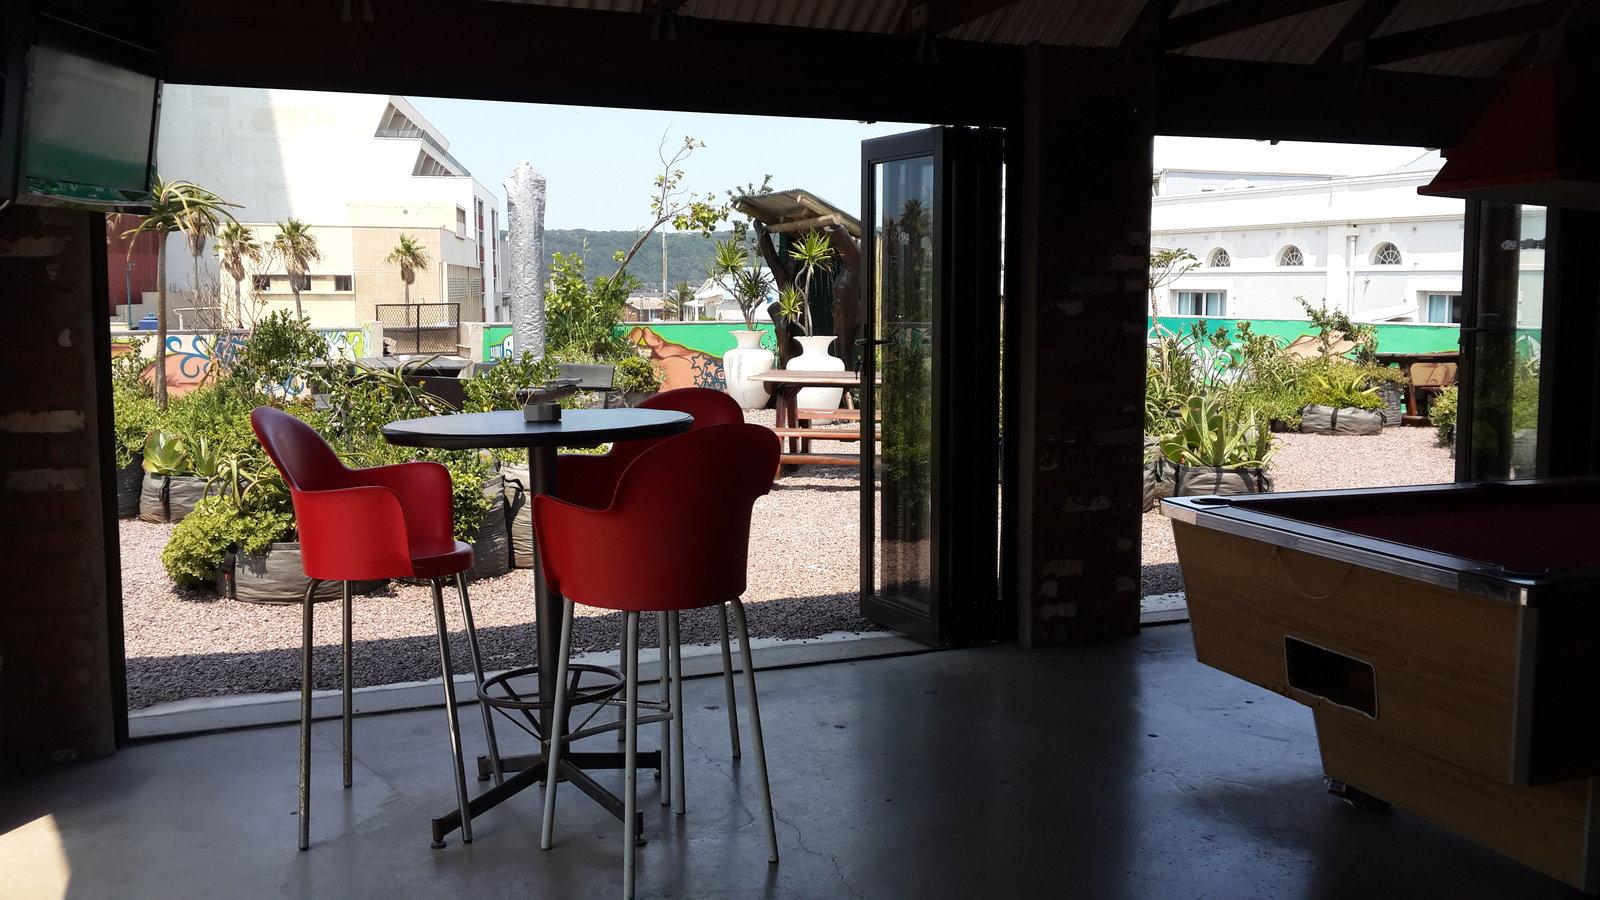 Hostel Happy Hippo International Backpackers Durban